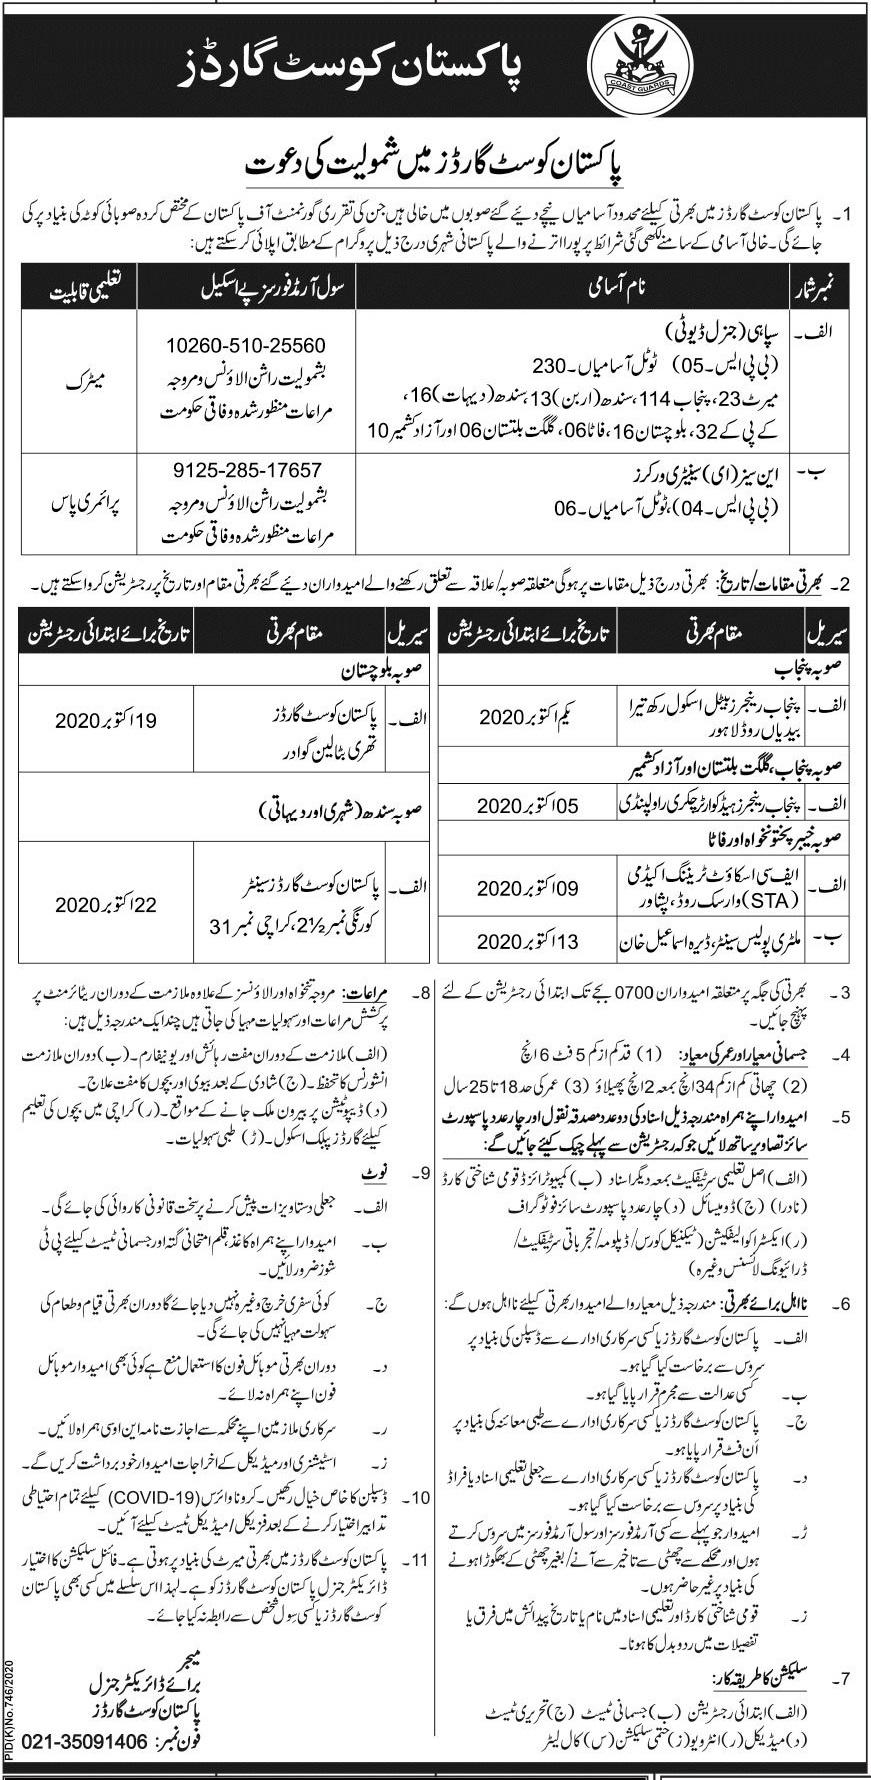 Pakistan Coast Guards Jobs 2020 in Karachi